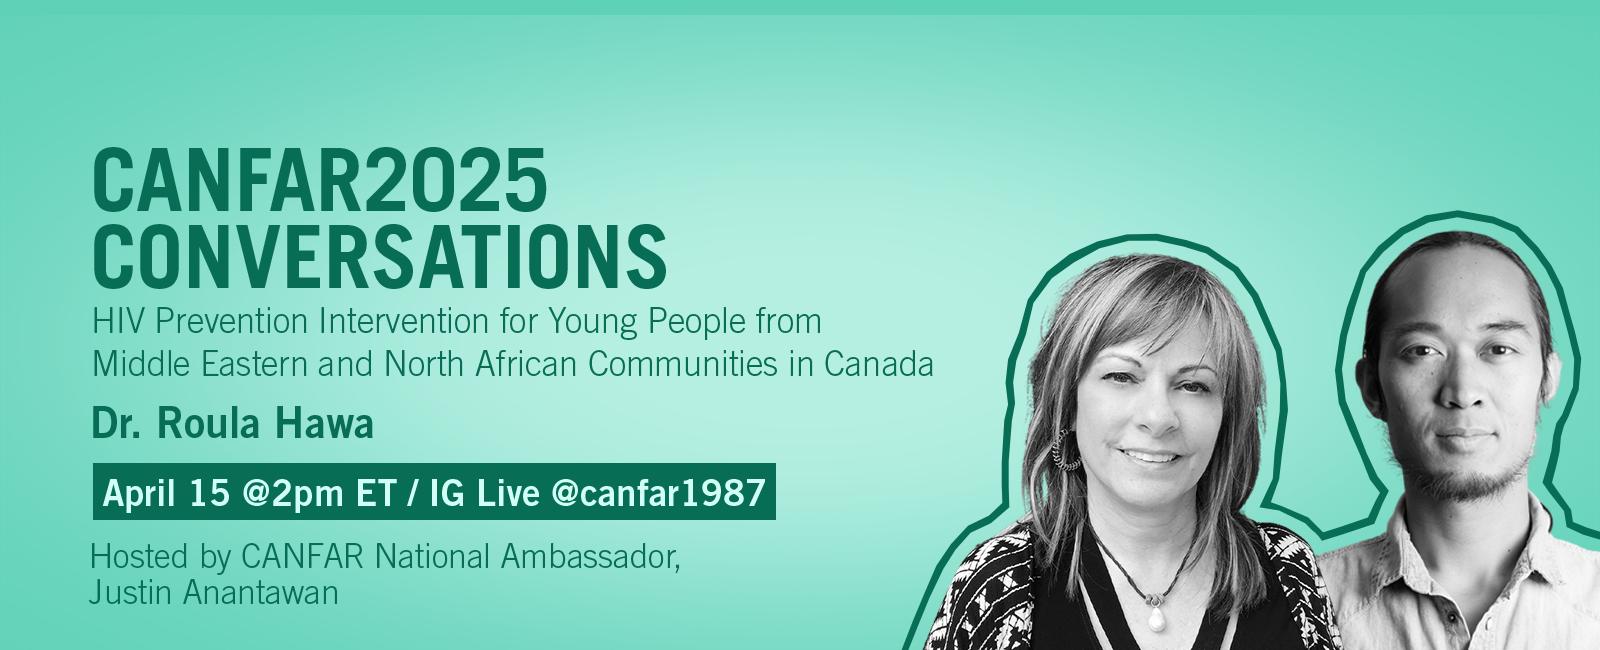 CANFAR2025 Conversations: Dr. Roula Hawa